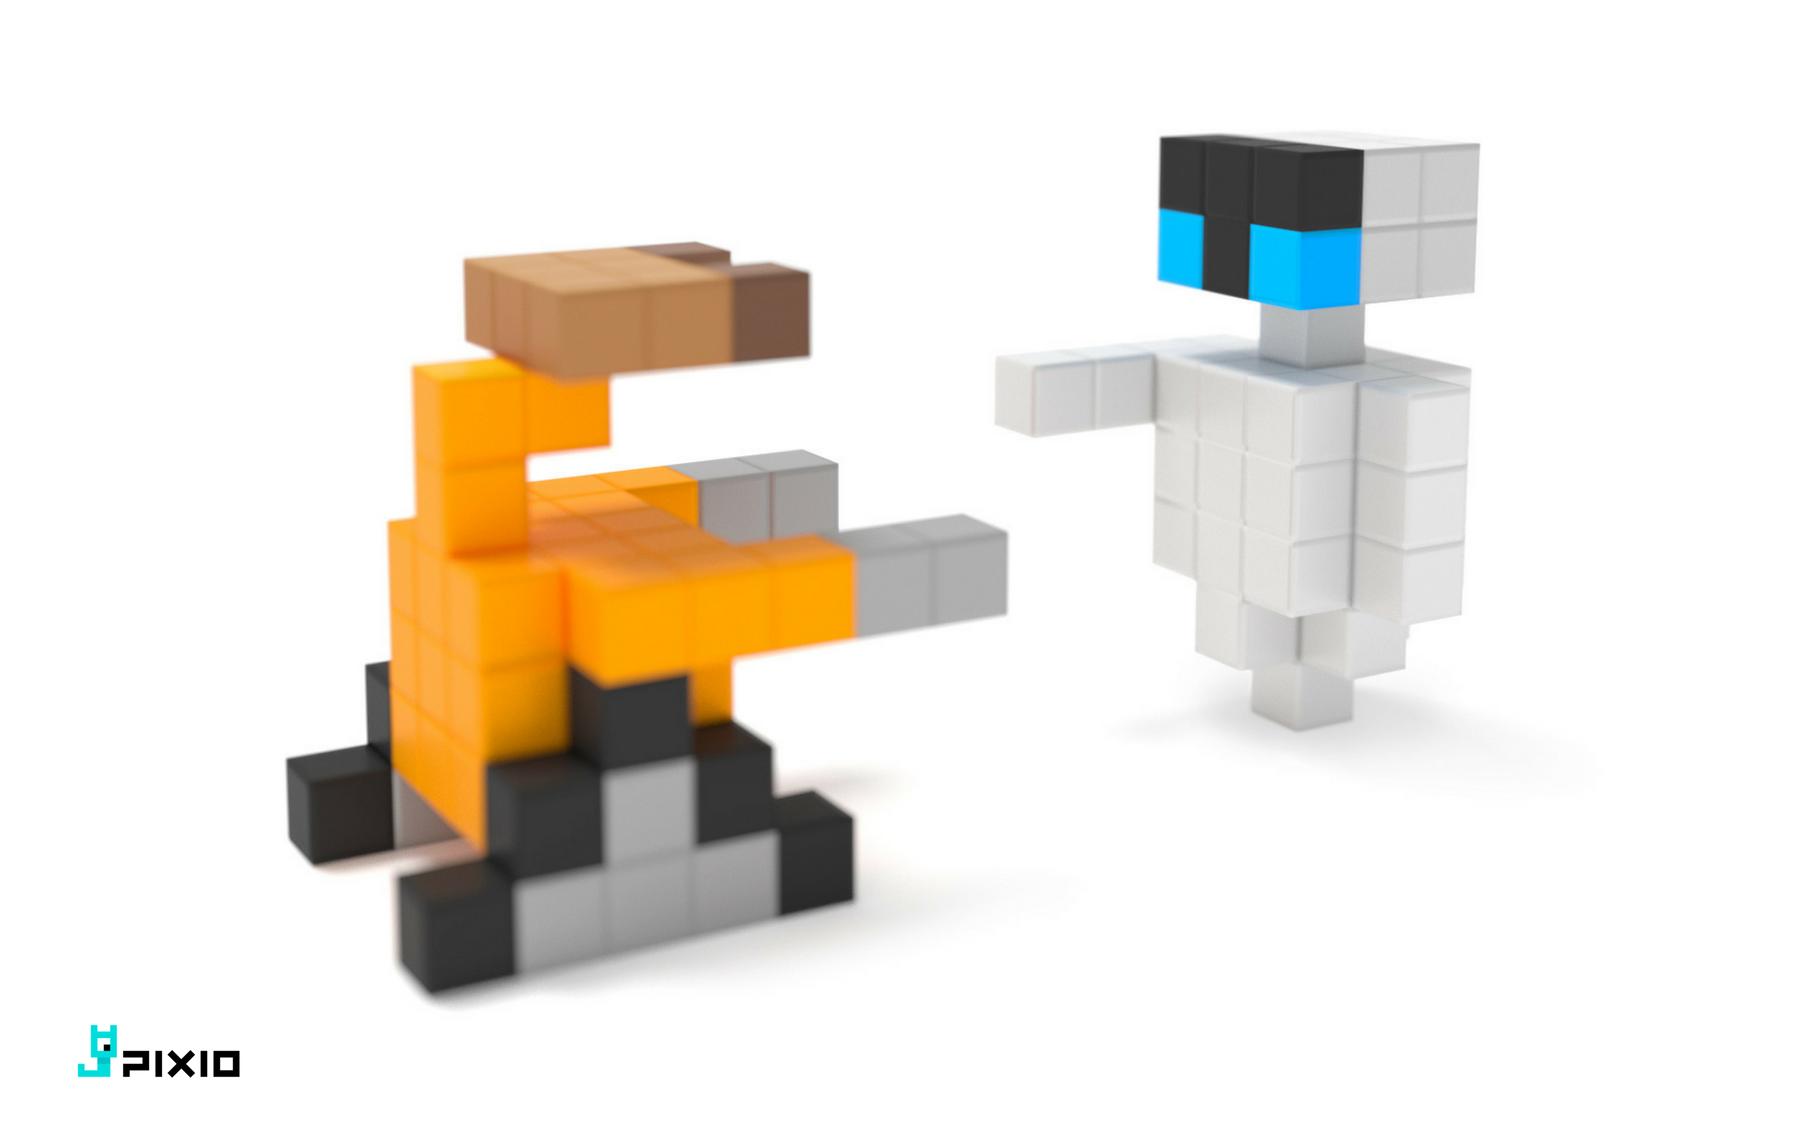 Magnetic Construction Set In The Pixel Art Style Pixel Art